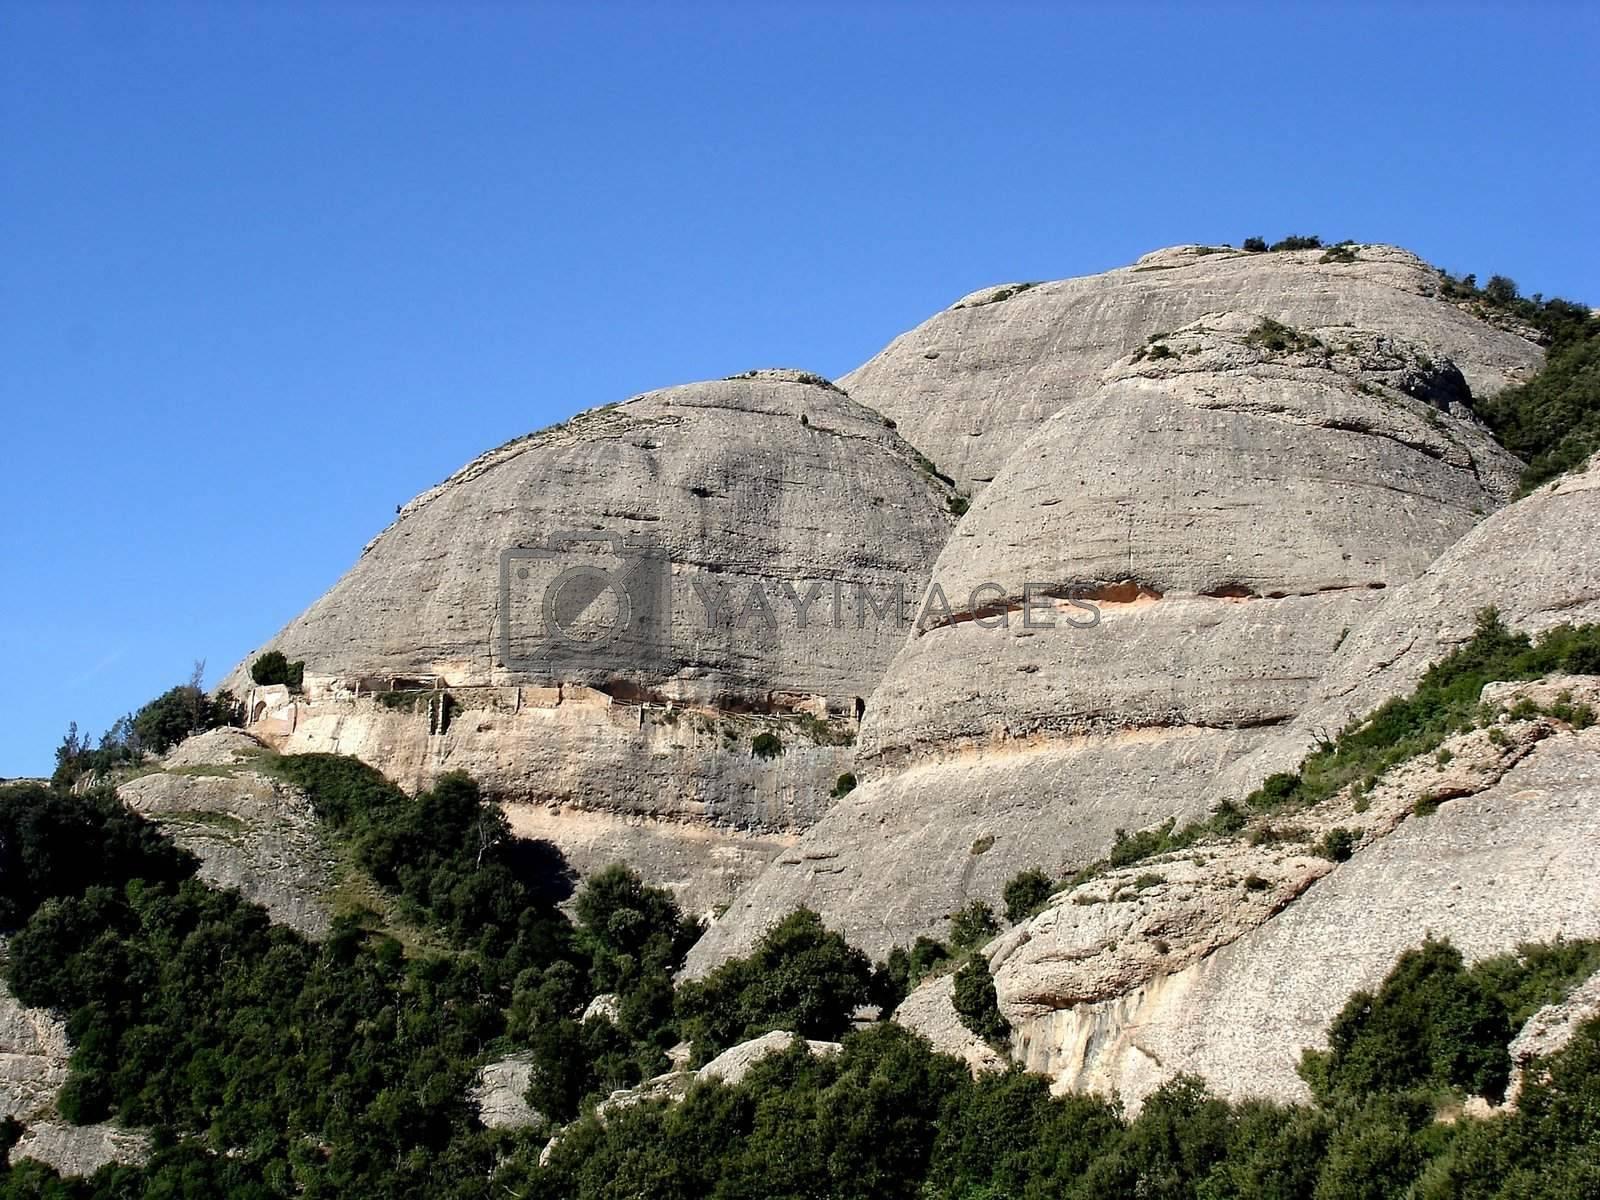 View of Sant Joan mountain at Montserrat abbey